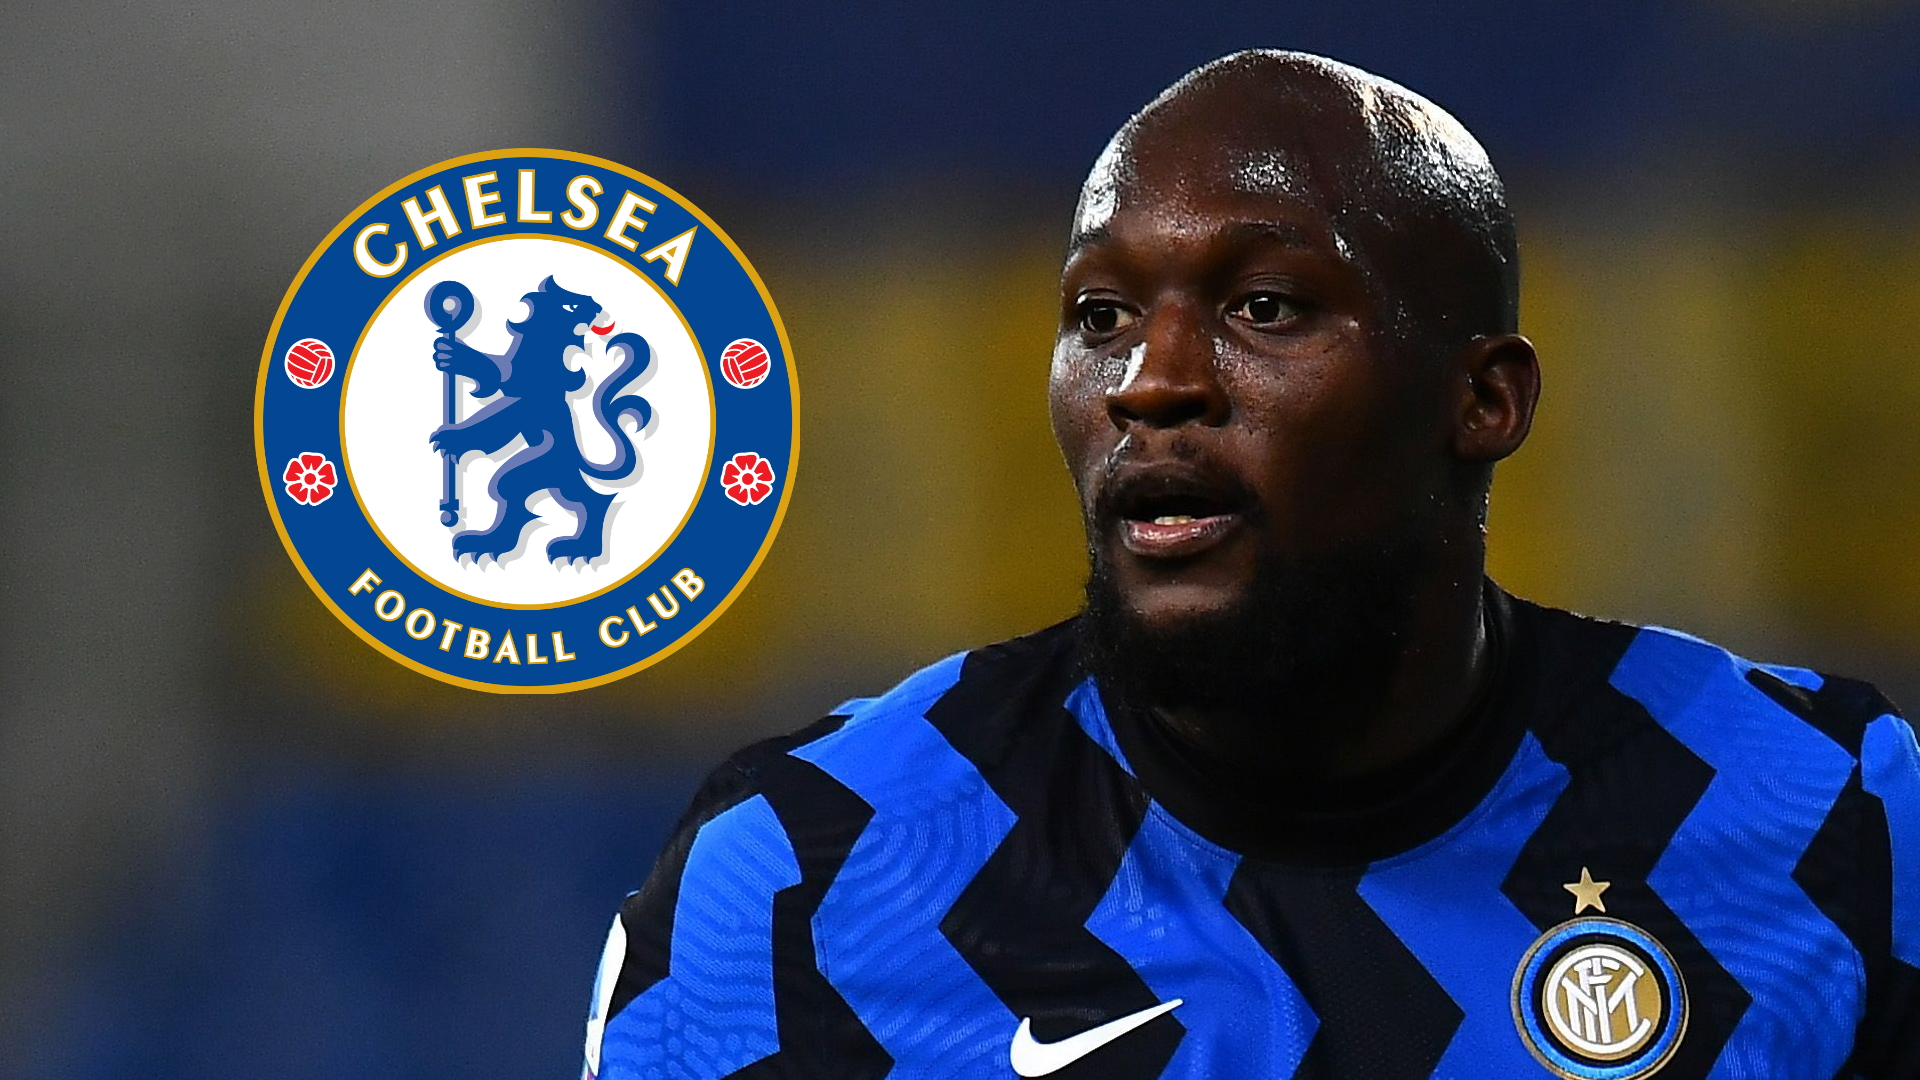 Chelsea complete £98m Lukaku transfer as striker returns to Stamford Bridge from Inter